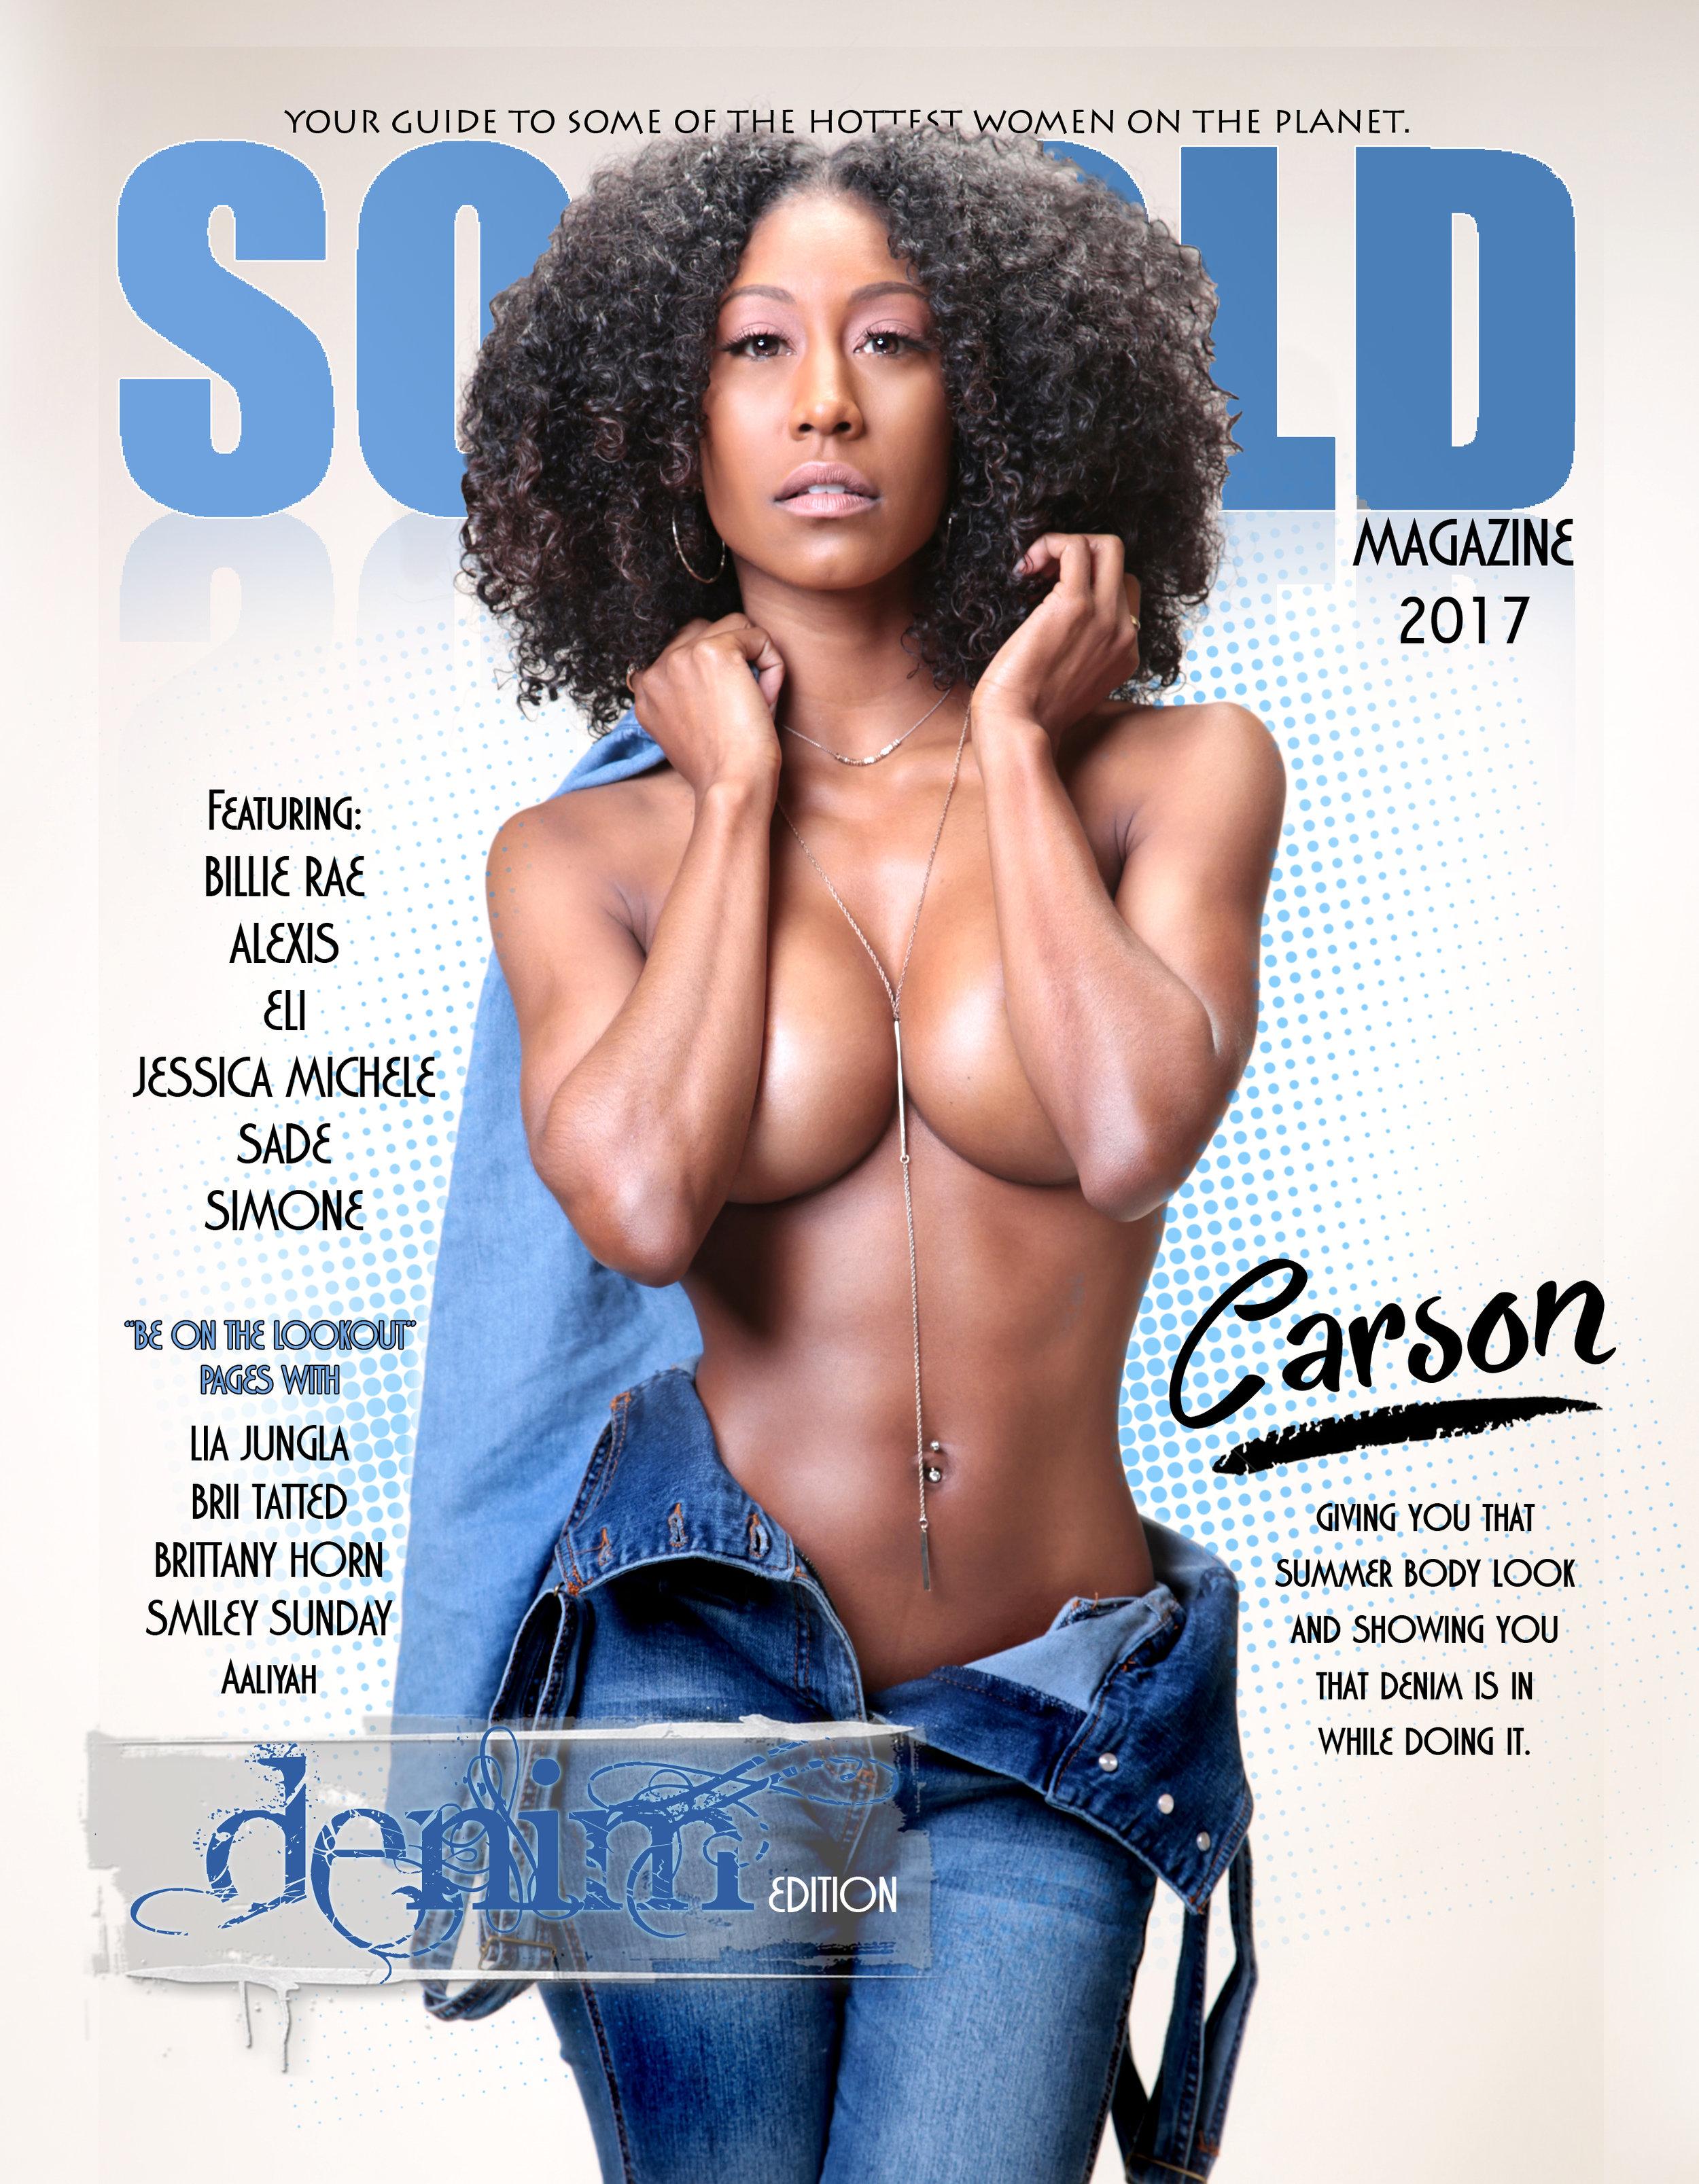 CARSON COVER 1 copy.jpg